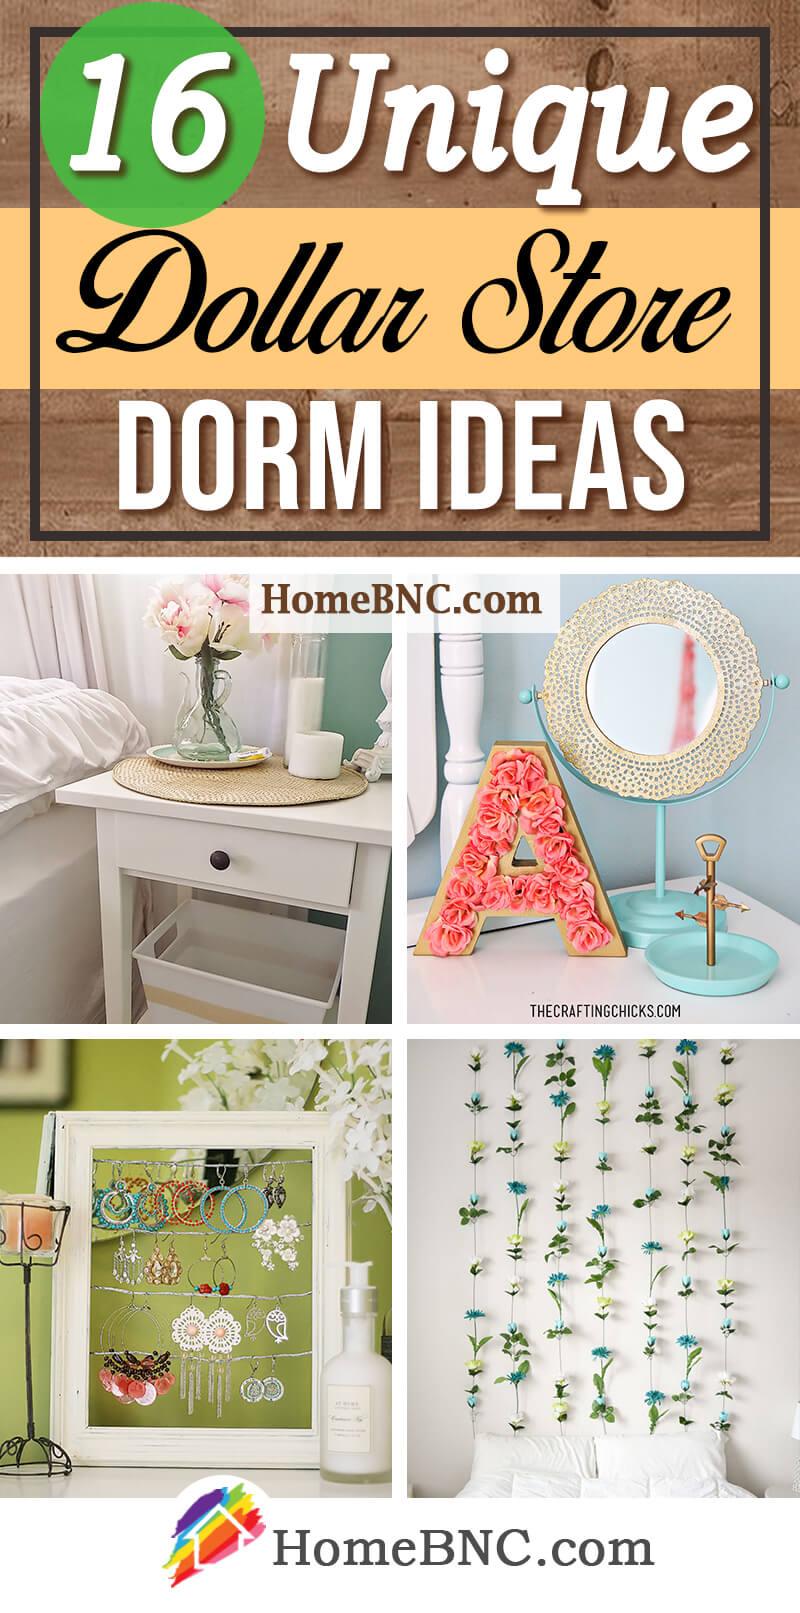 Best Dollar Store Dorm Room Ideas